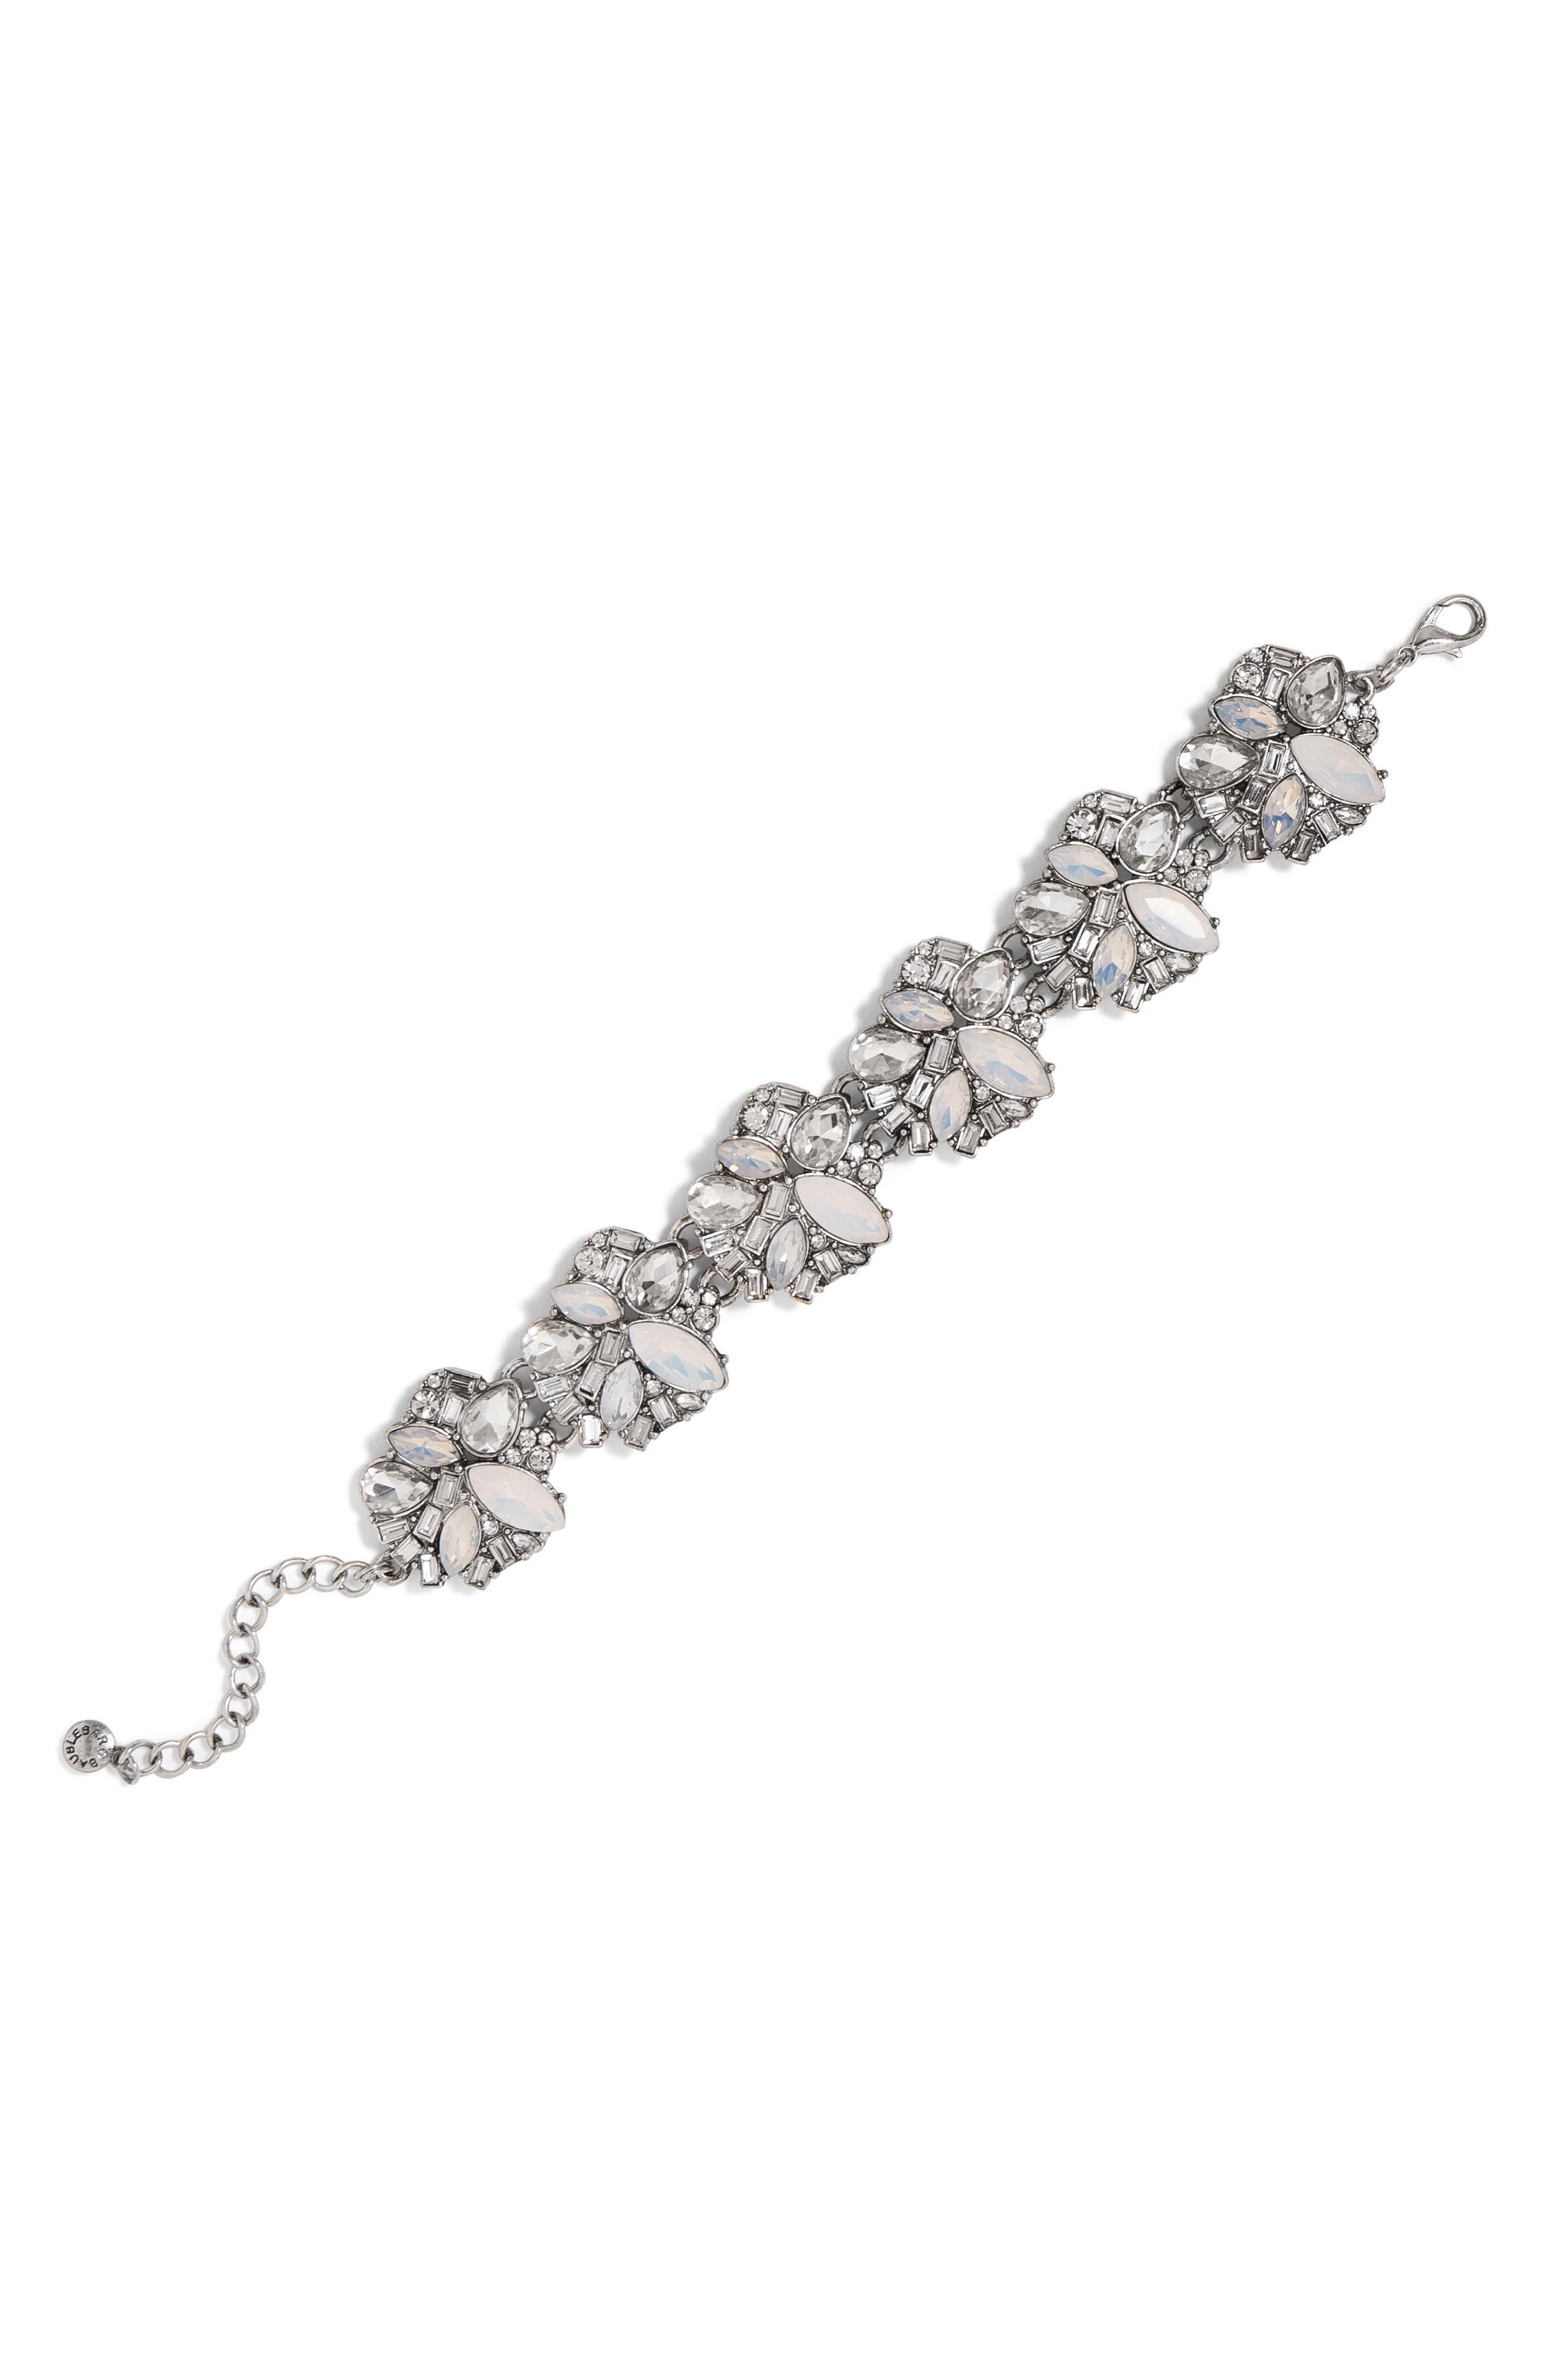 Beatriz Crystal Shatter Bracelet,                             Main thumbnail 1, color,                             Silver